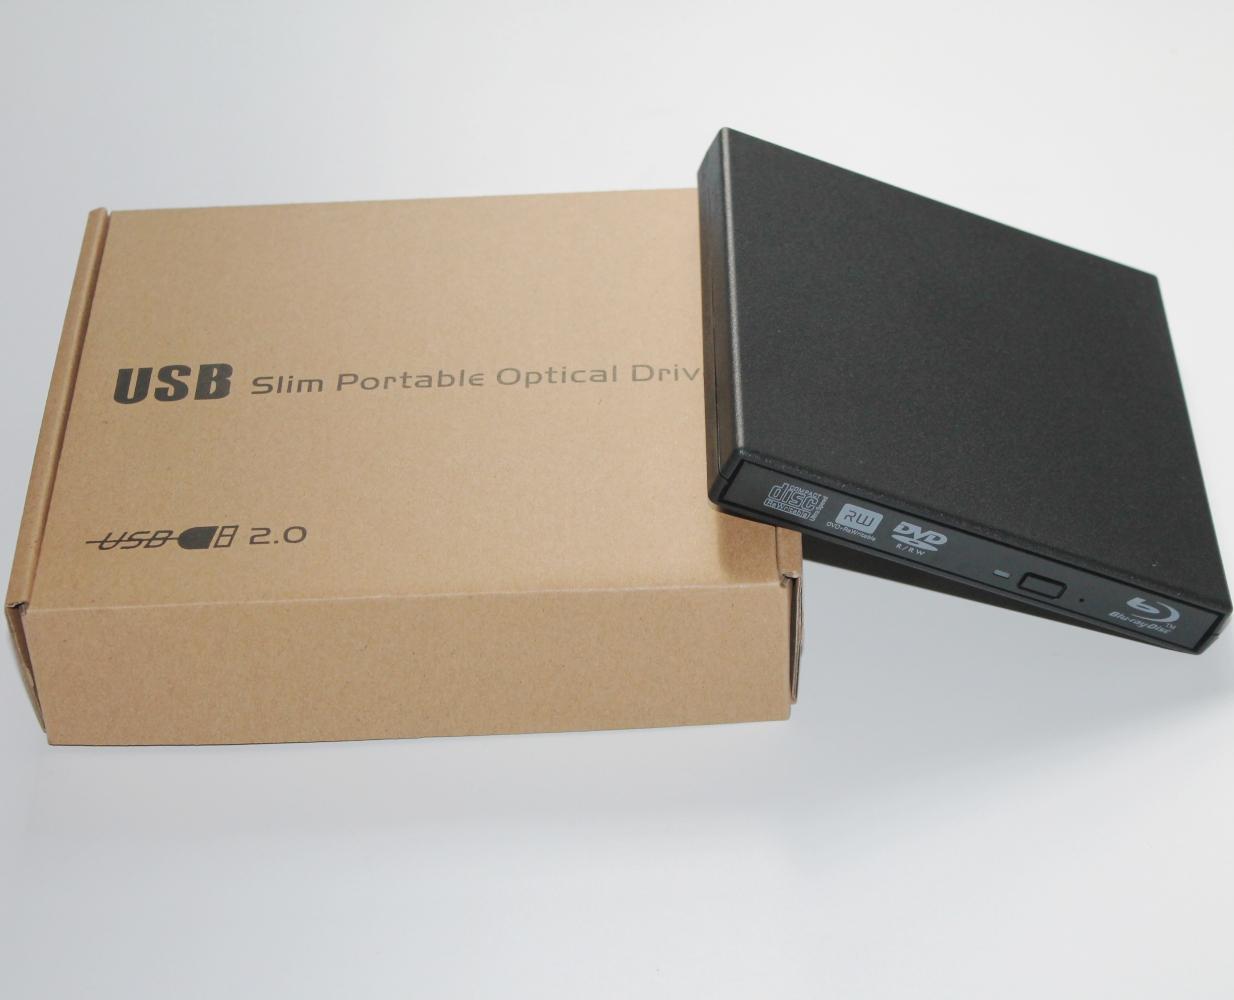 Black slim USB 2.0 External BD <font><b>Blu</b></font> <font><b>Ray</b></font> DVD RW DVD DL CD RW Drive Writer Burner For WINDOWS XP/7/8/10 Mac Desktop Laptop